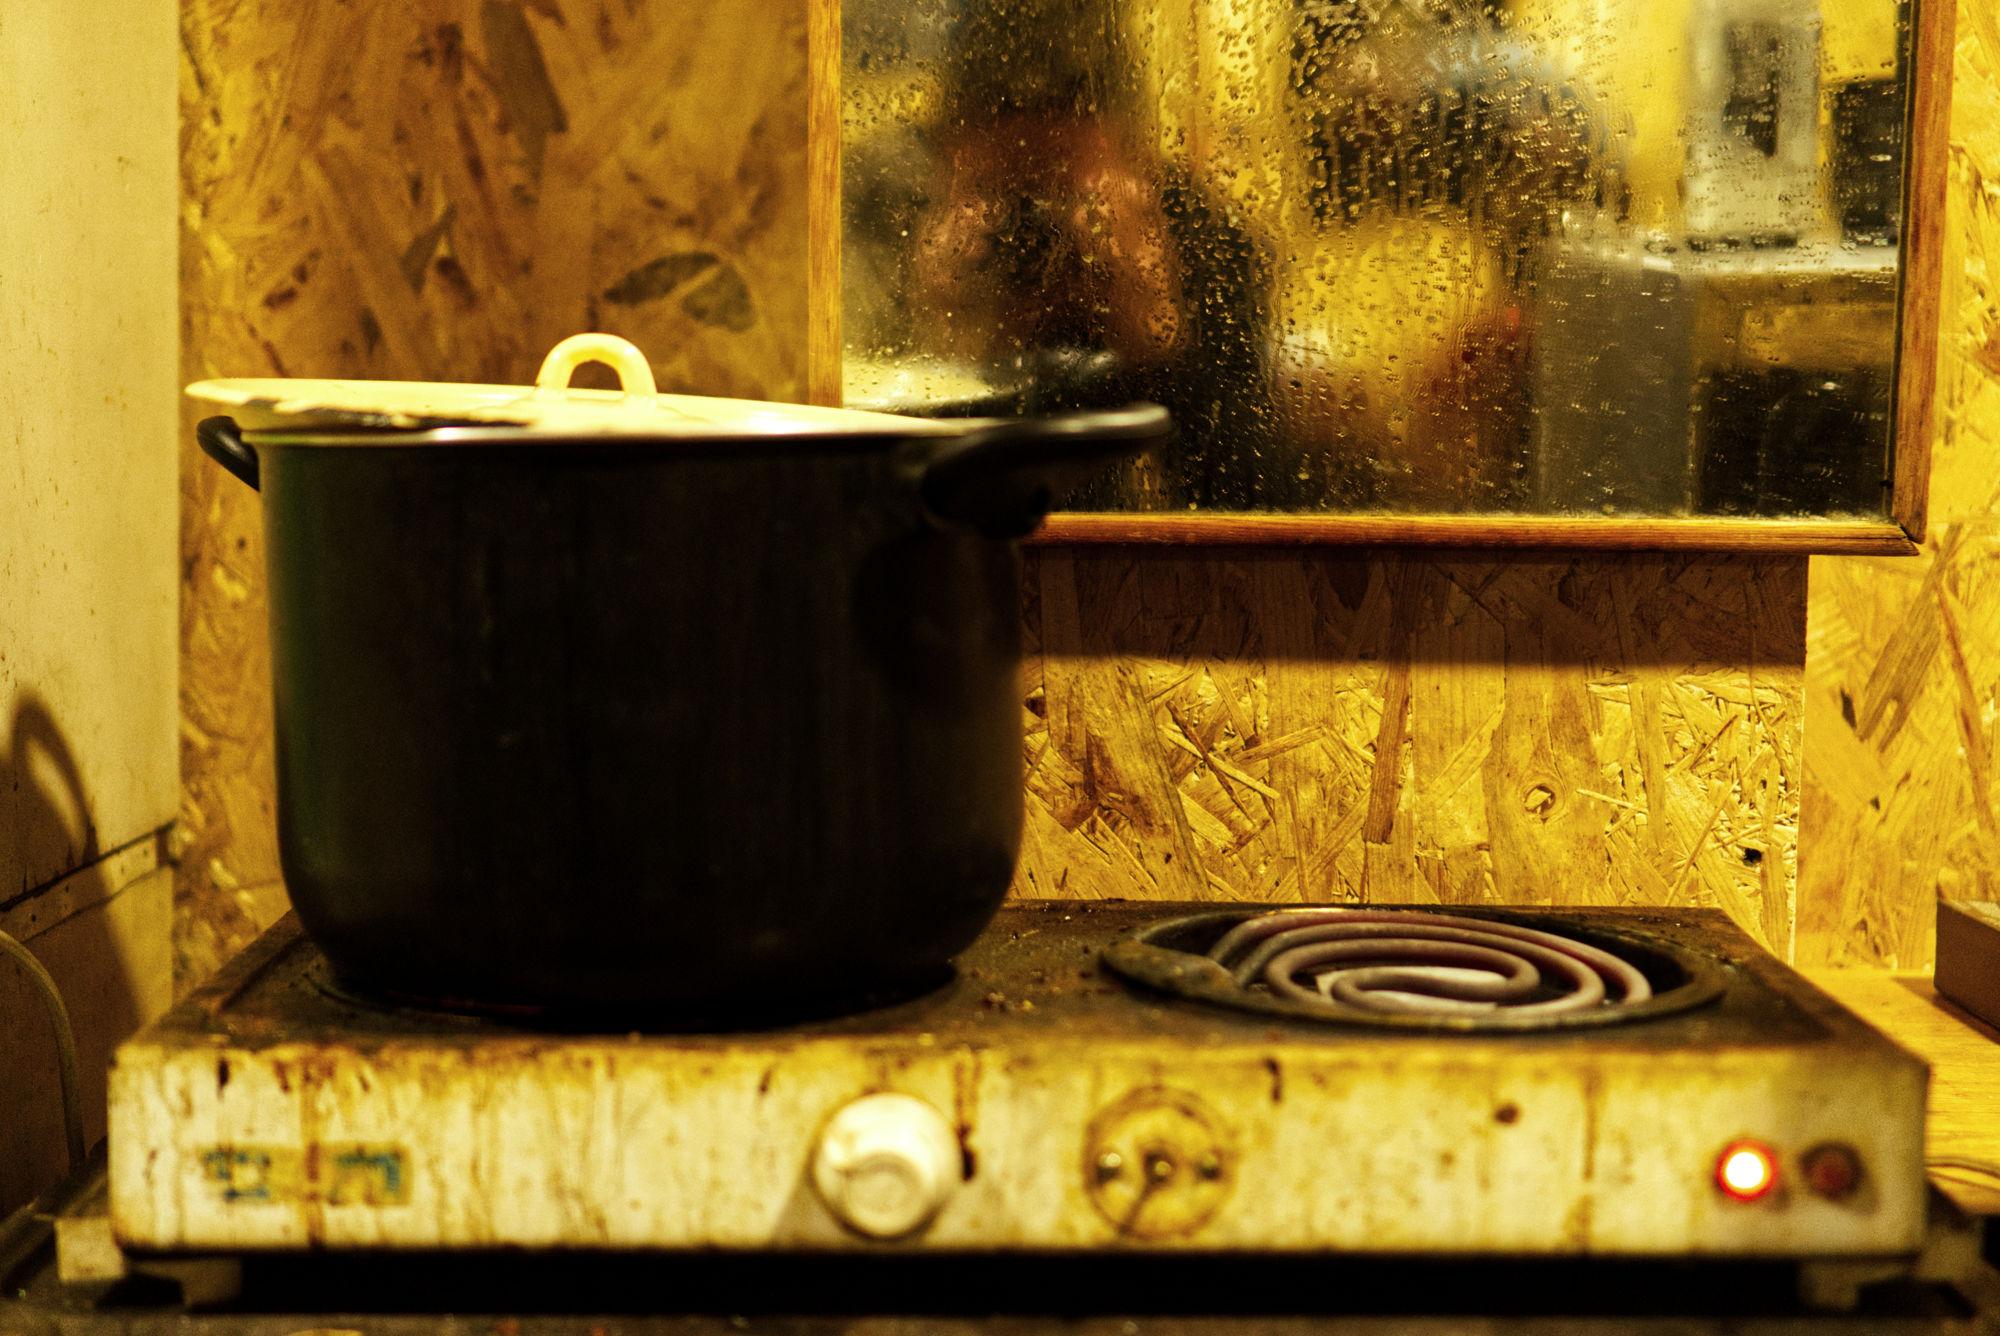 Food cooking at Kosmo Station.